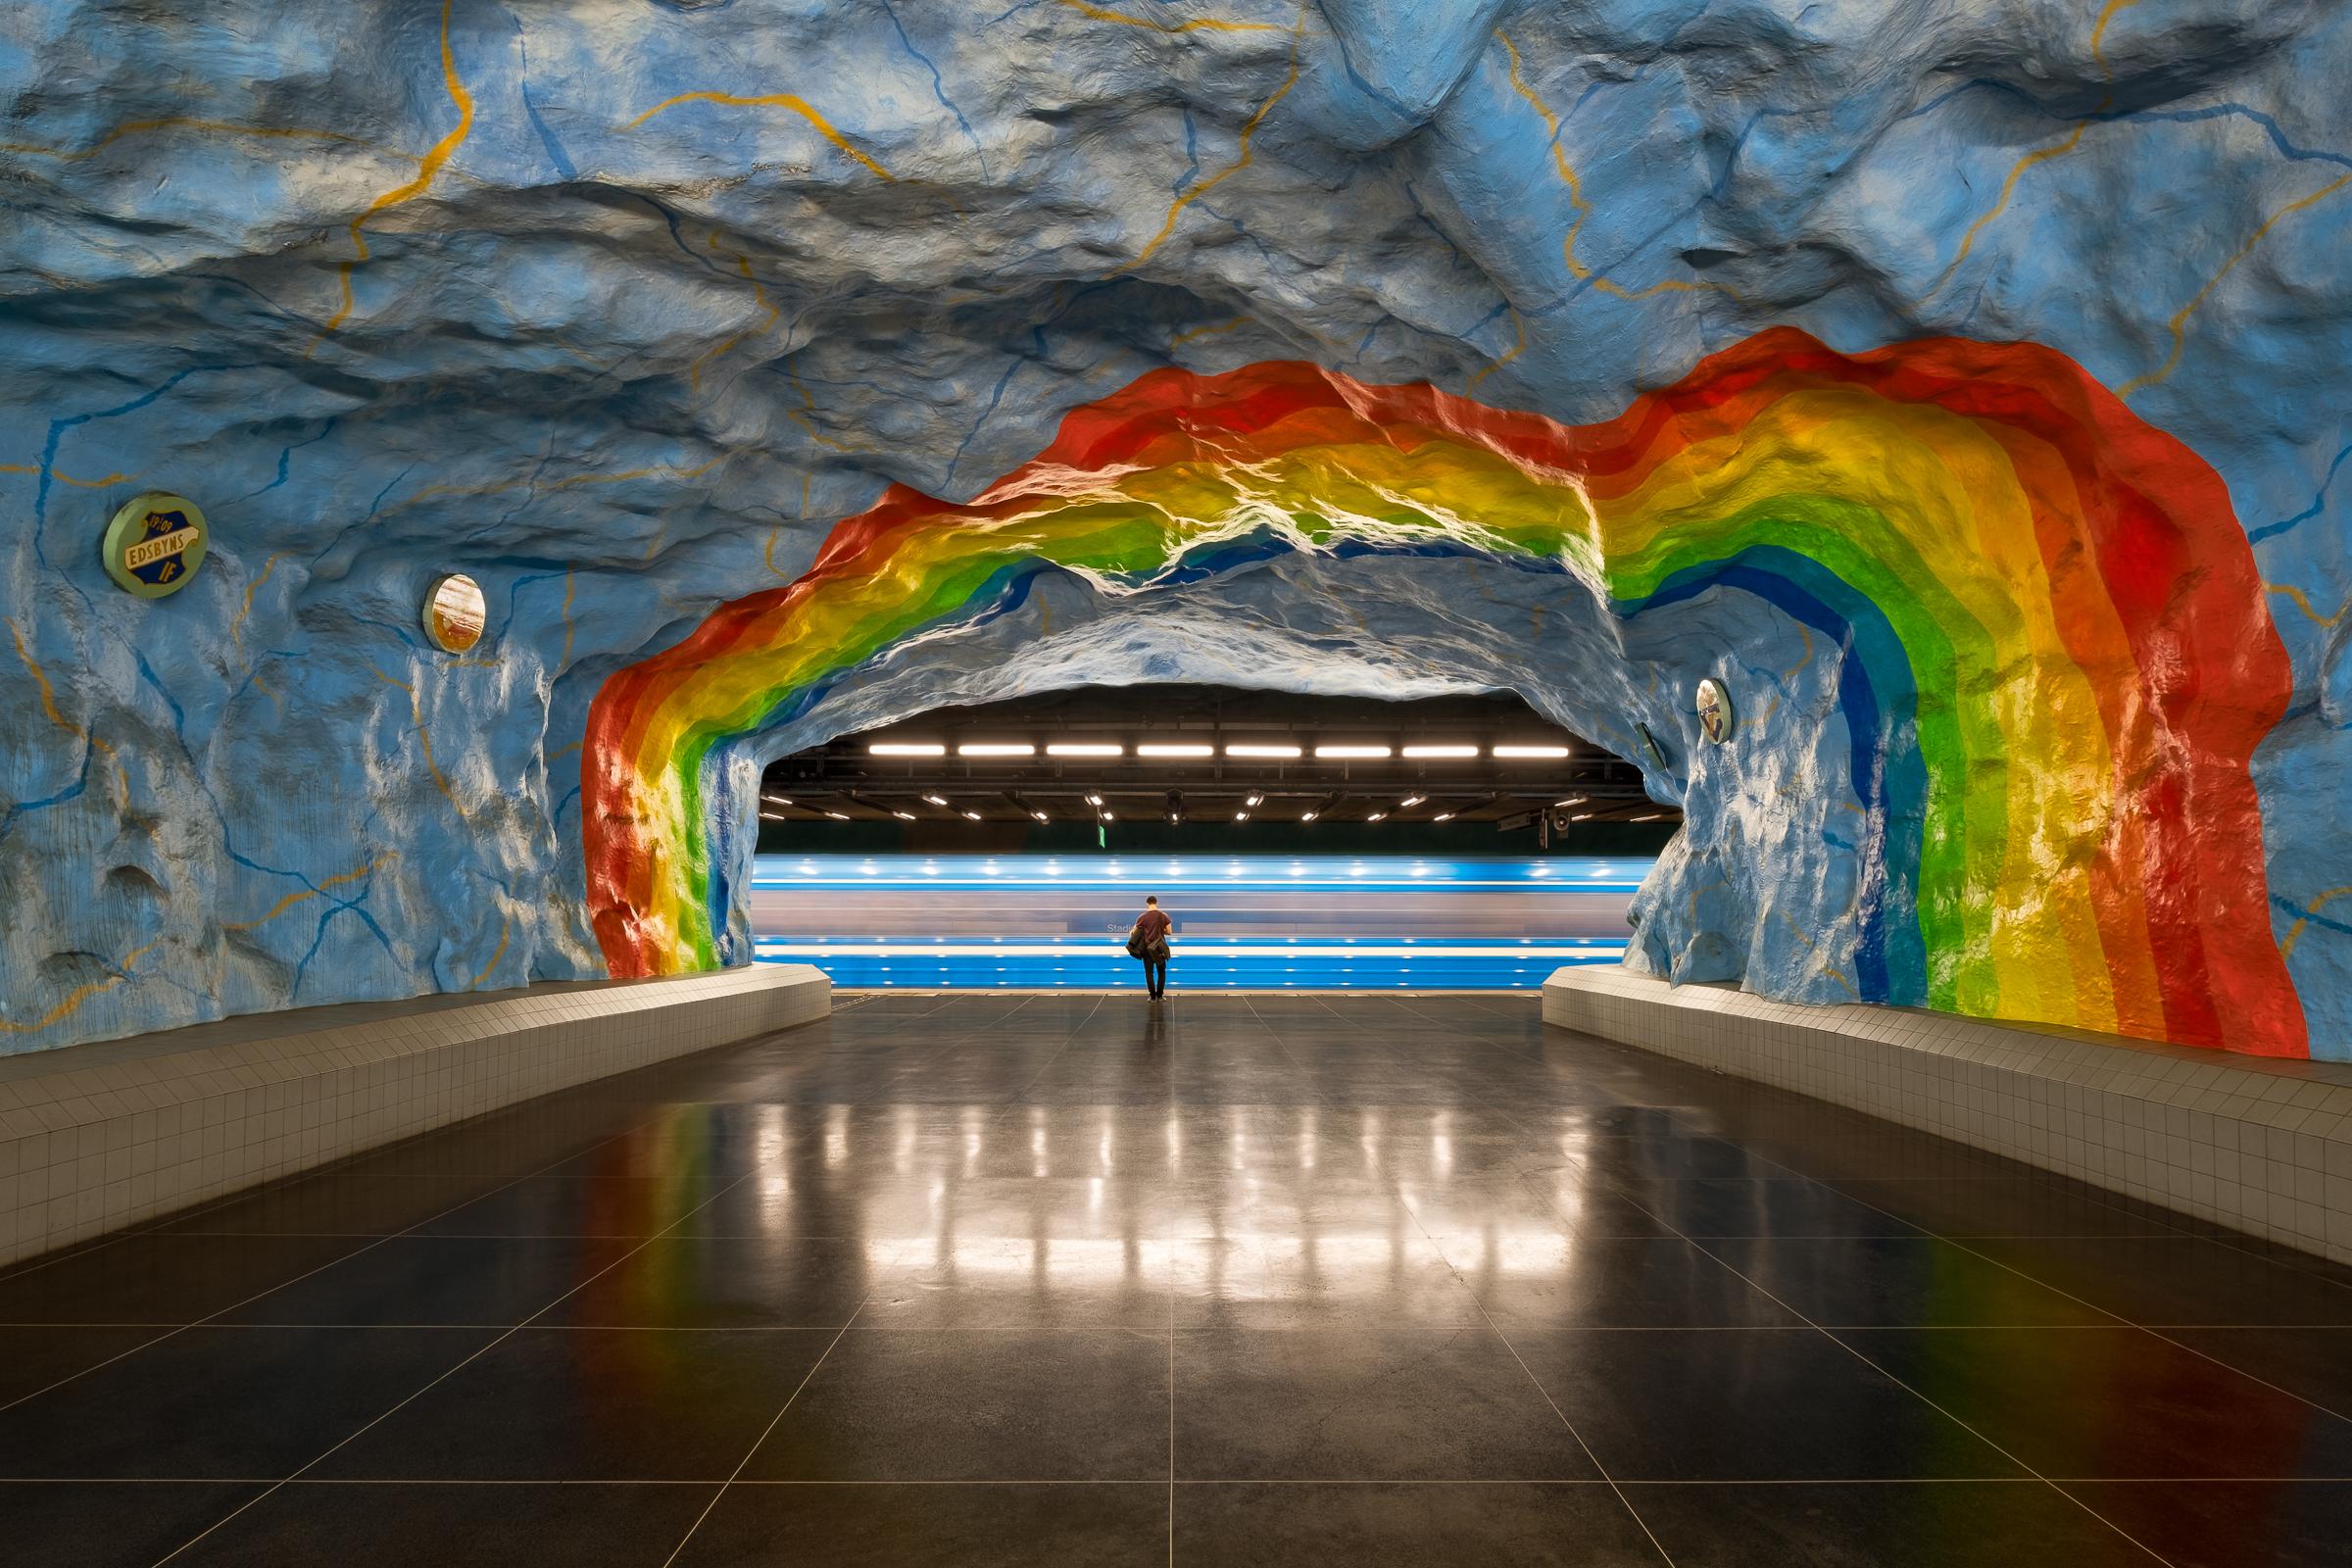 Somewhere Under The Rainbow